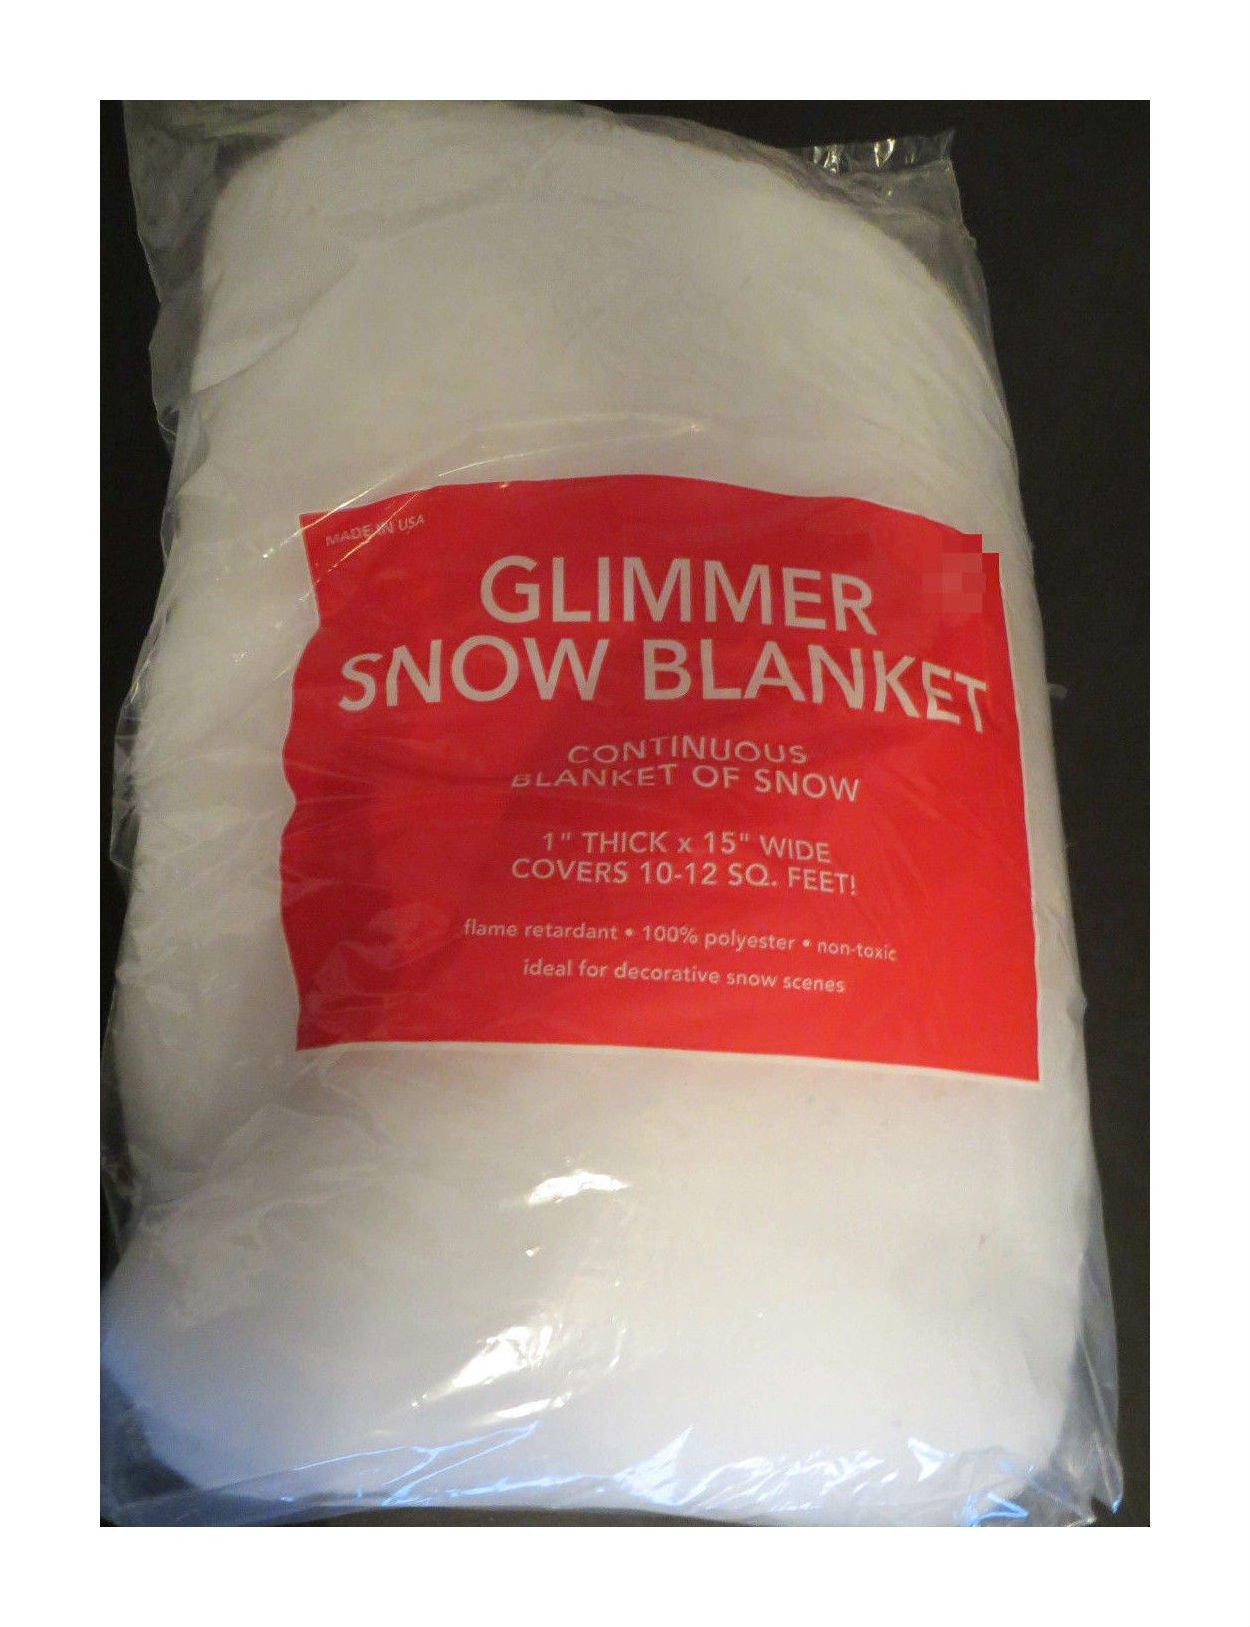 Glimmer white Snow Blanket Glitter flame retardent christmas decoration village